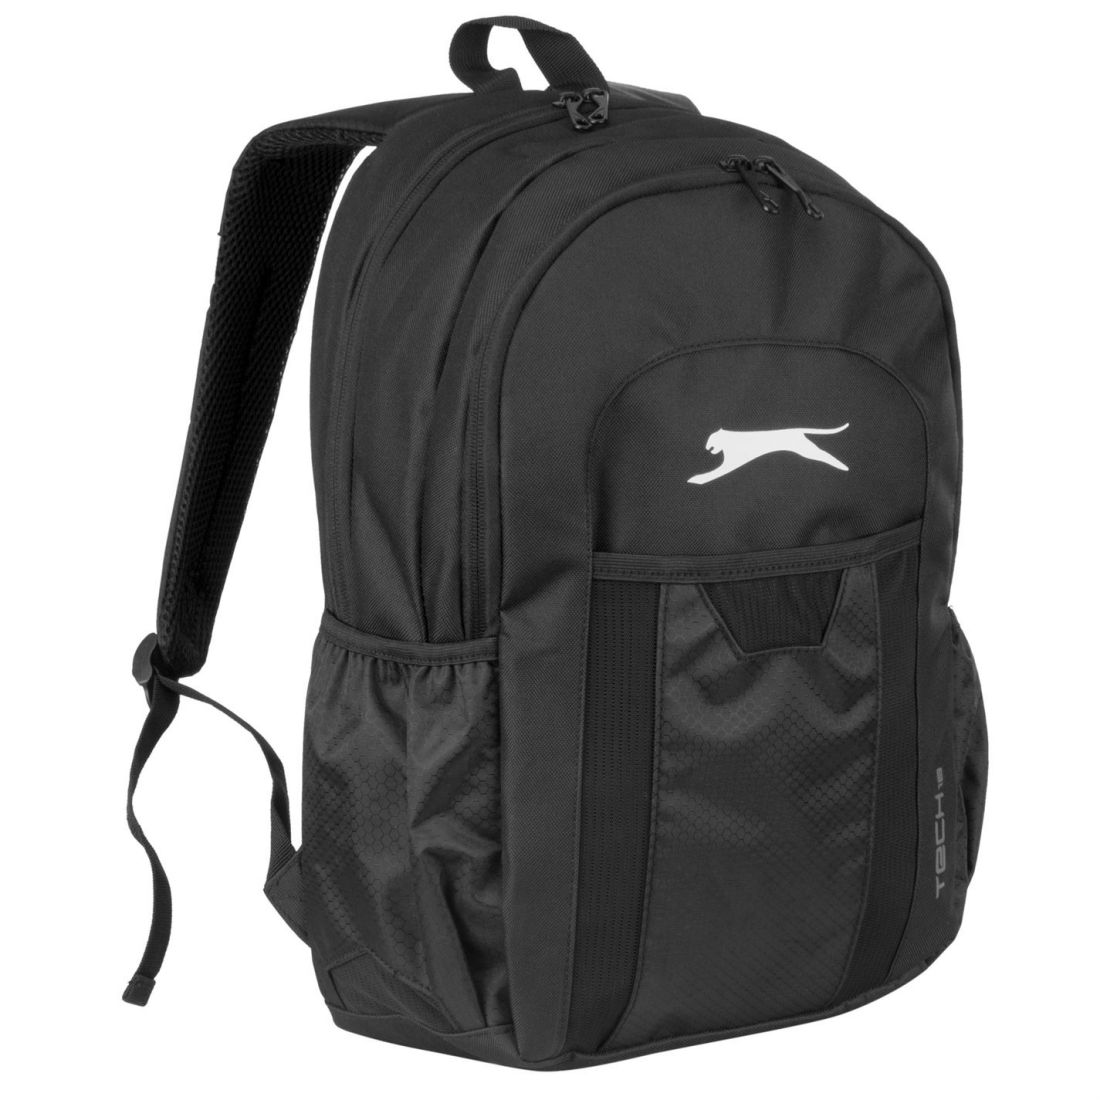 Sondico Unisex Boot Bag Charcoal Sports Training Accessory